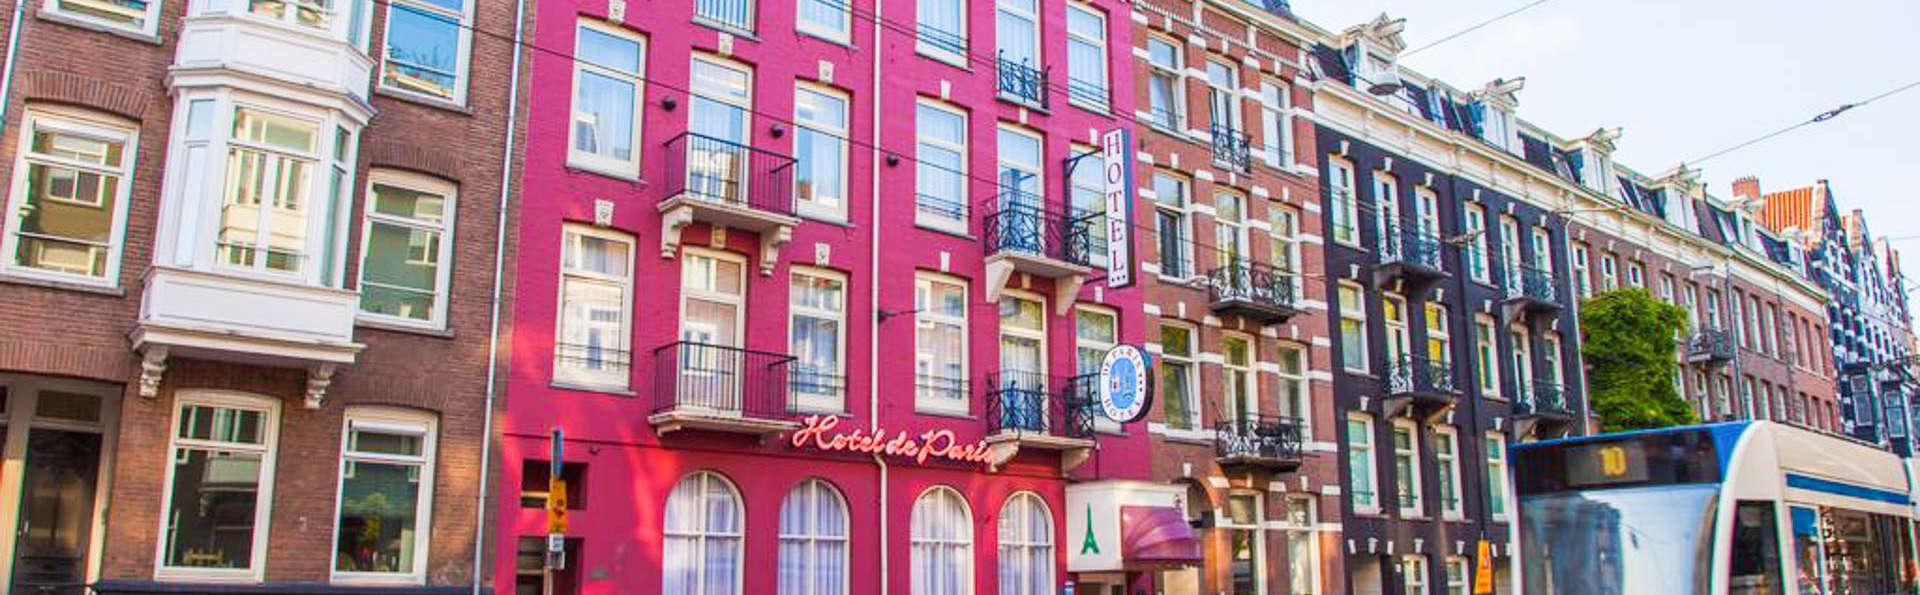 Hotel de Paris Amsterdam - EDIT_WEB_FRONT3.jpg